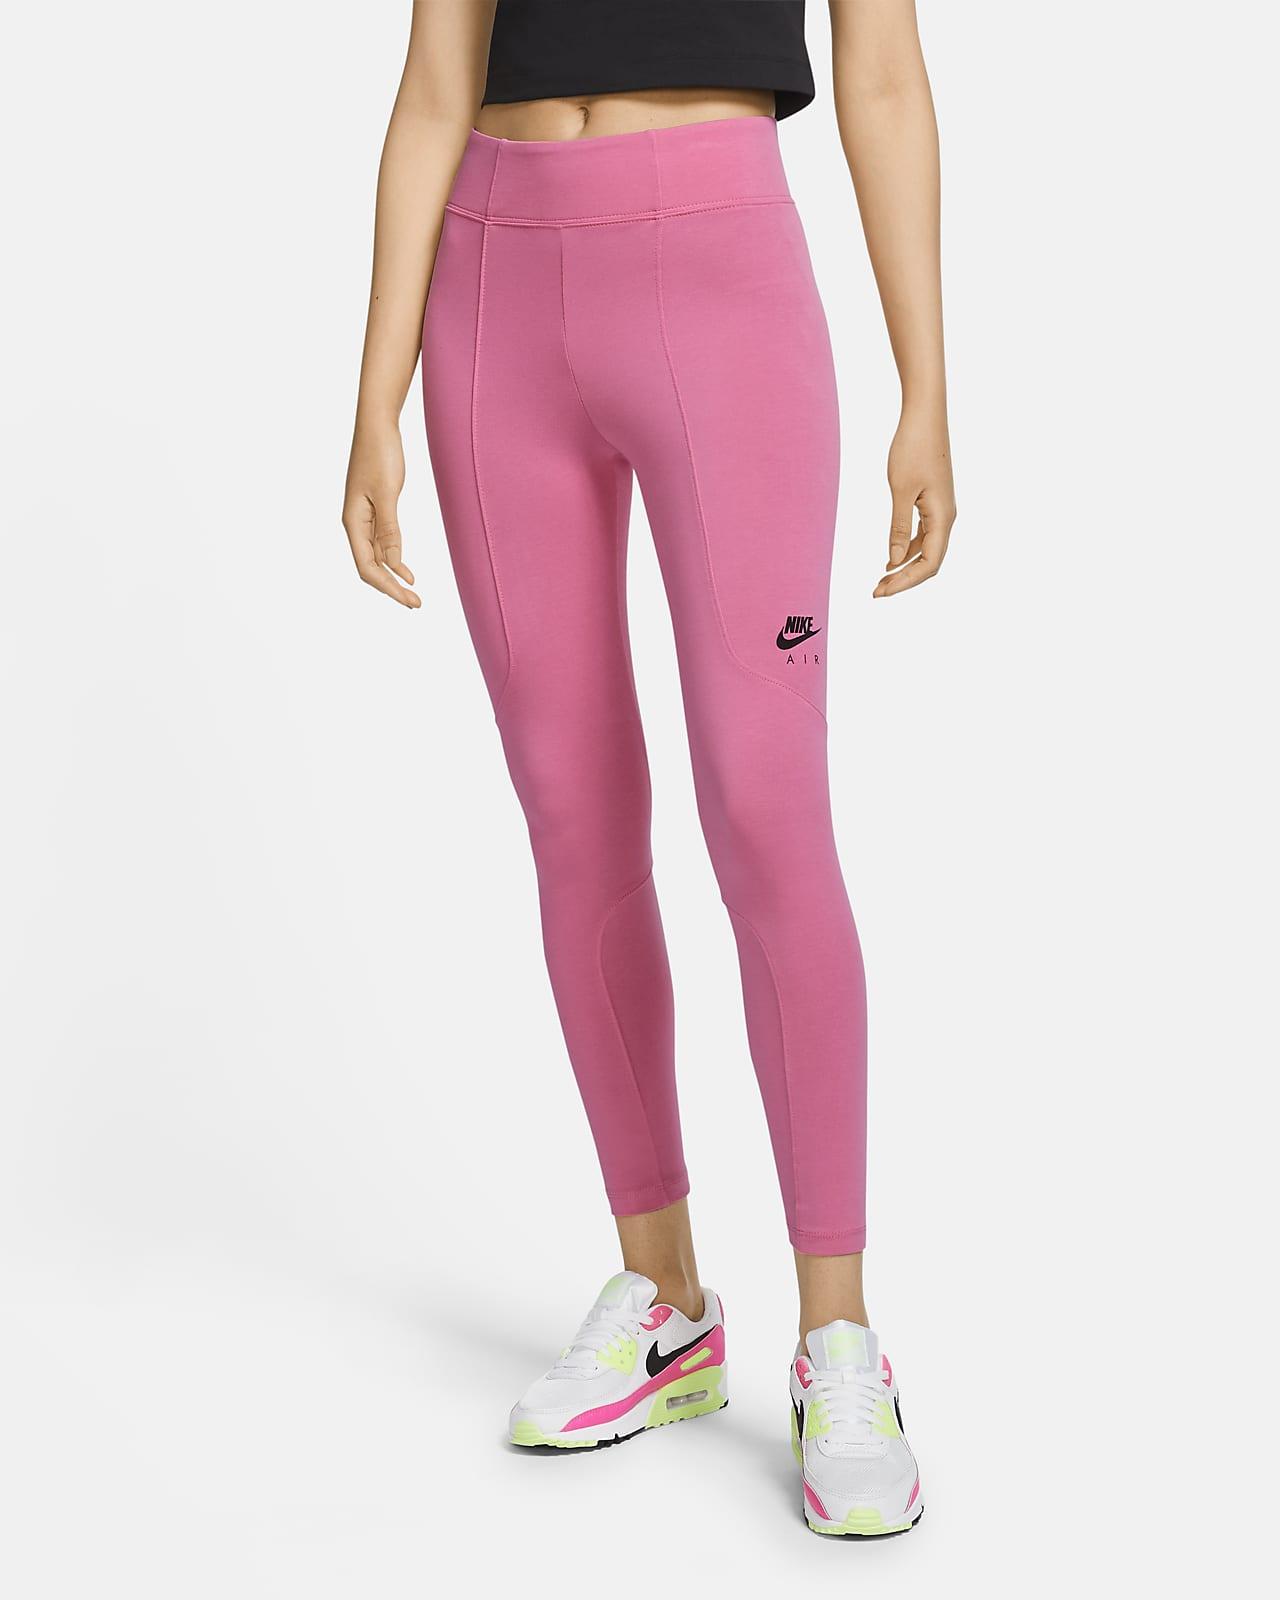 Nike Air Women's High-Waisted 7/8 Leggings